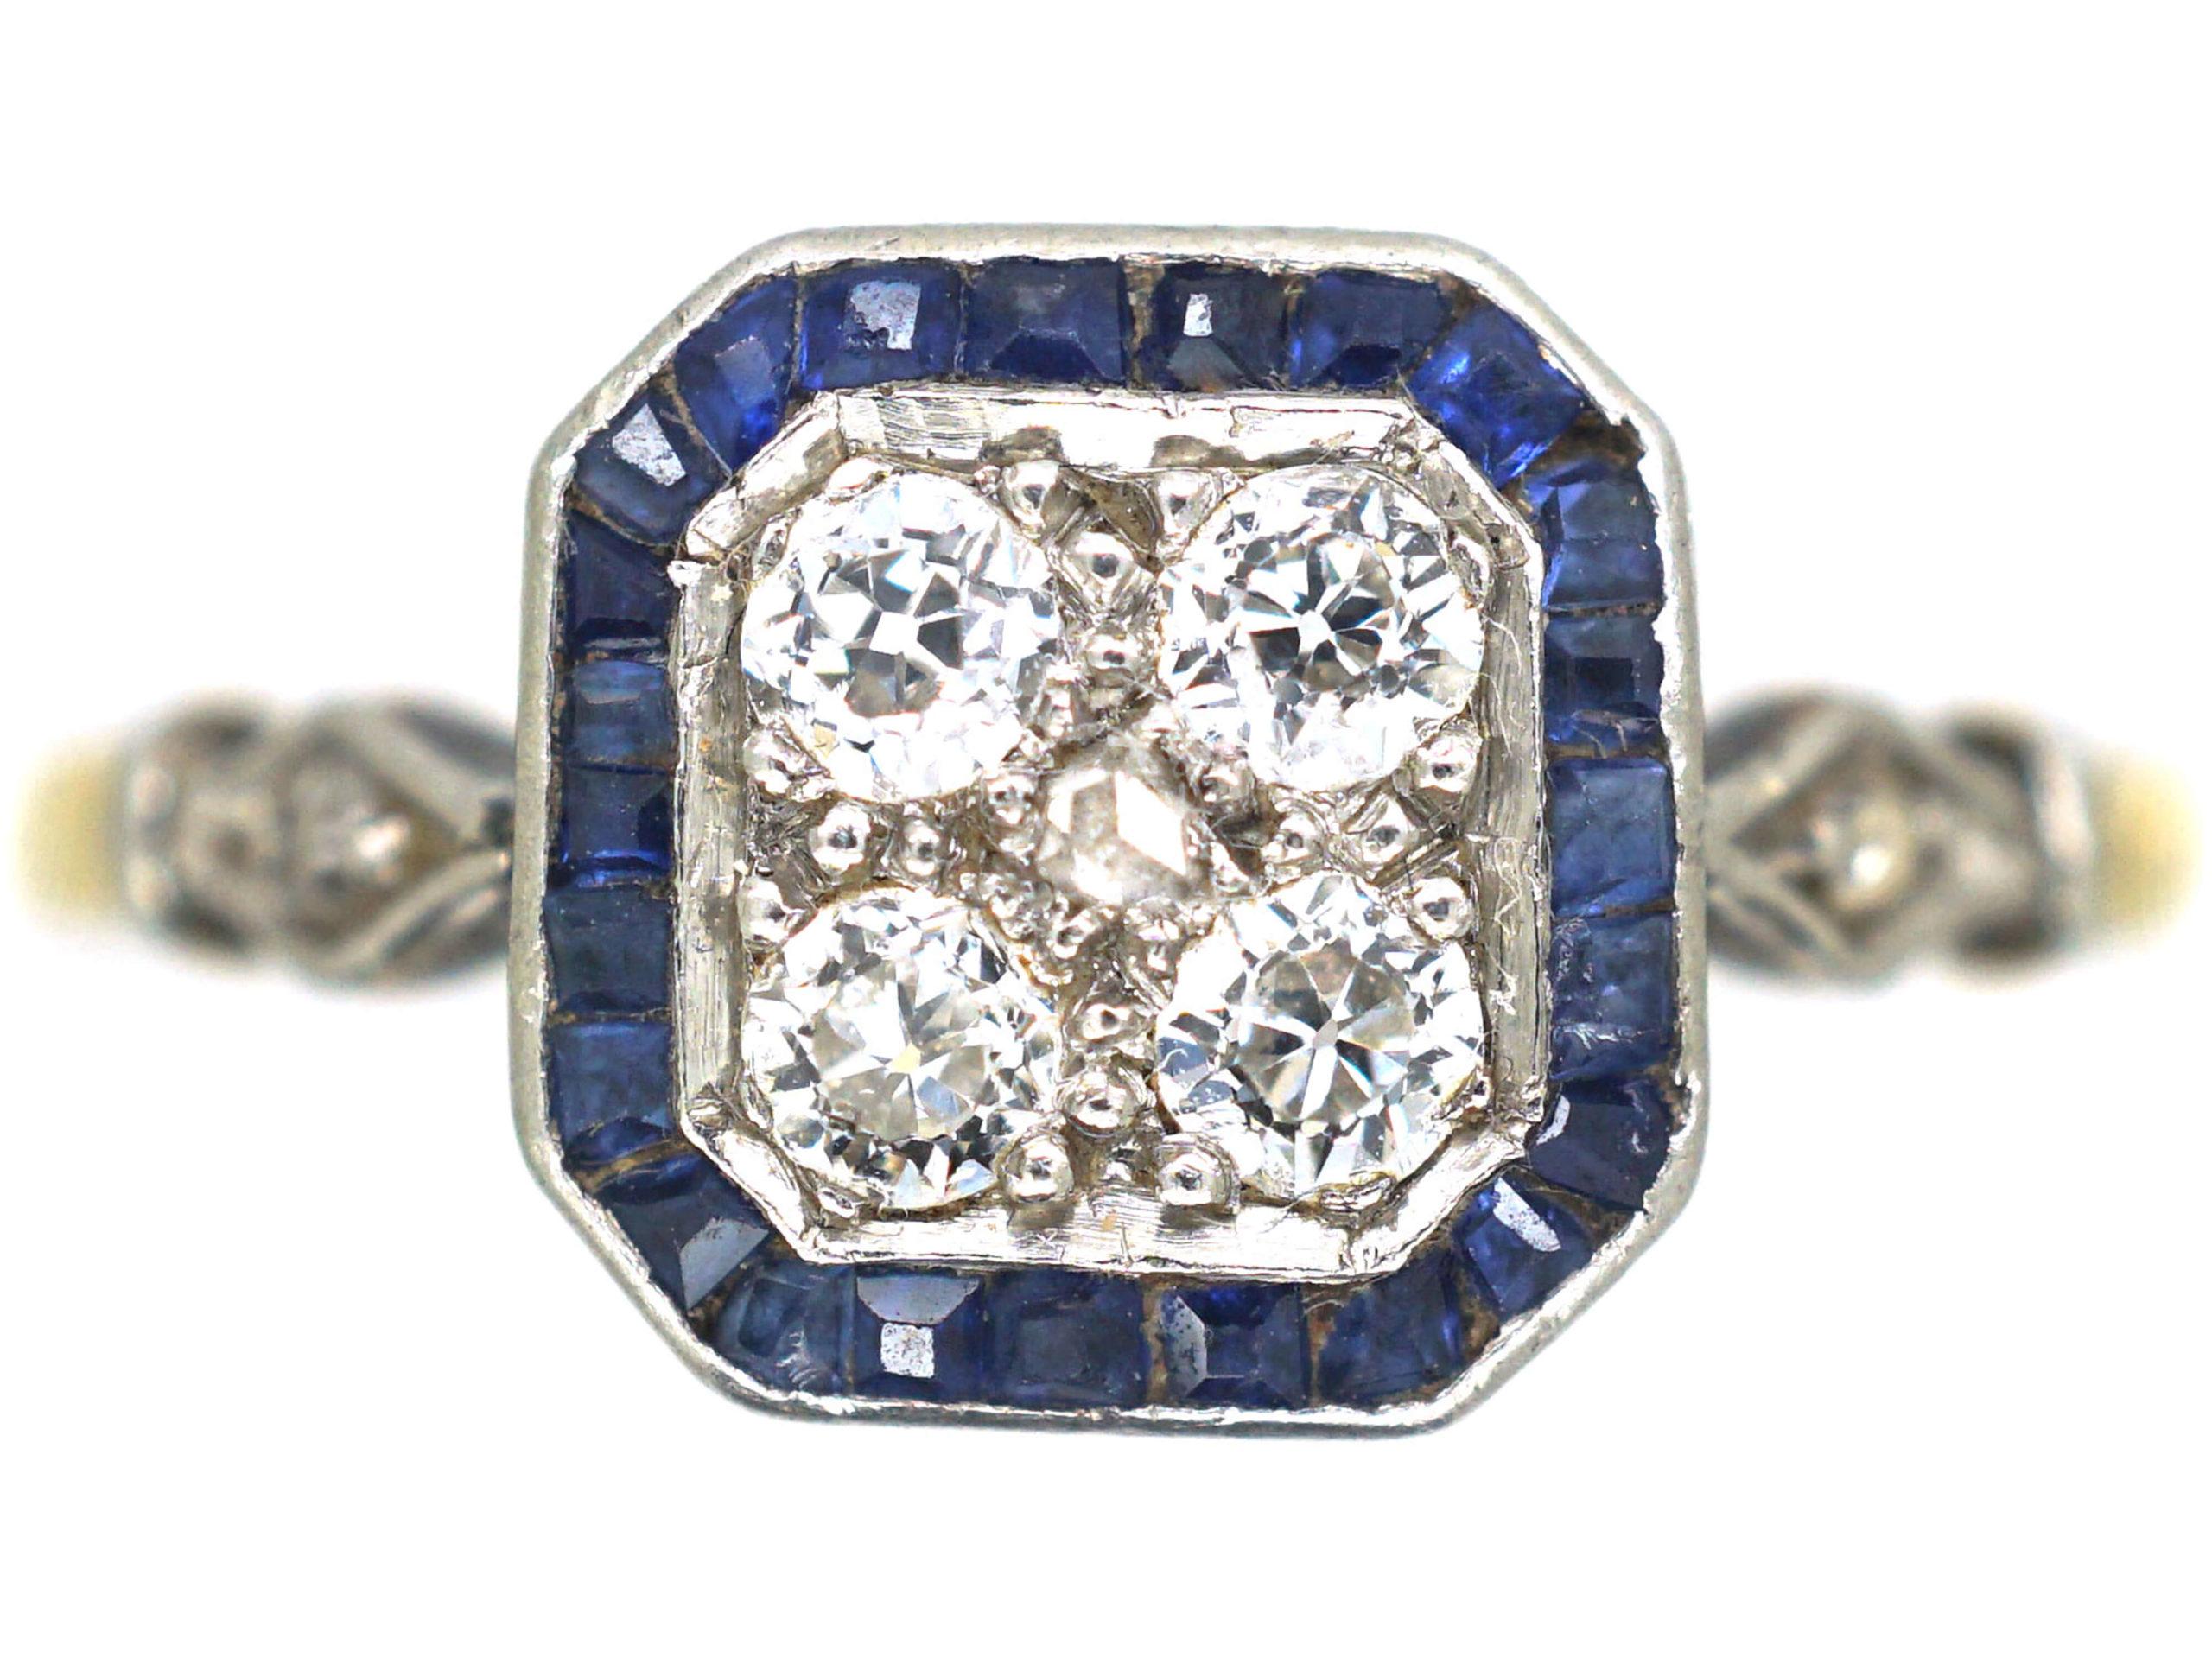 Art Deco 18ct Gold & Platinum, Sapphire & Diamond Octagonal Target Ring